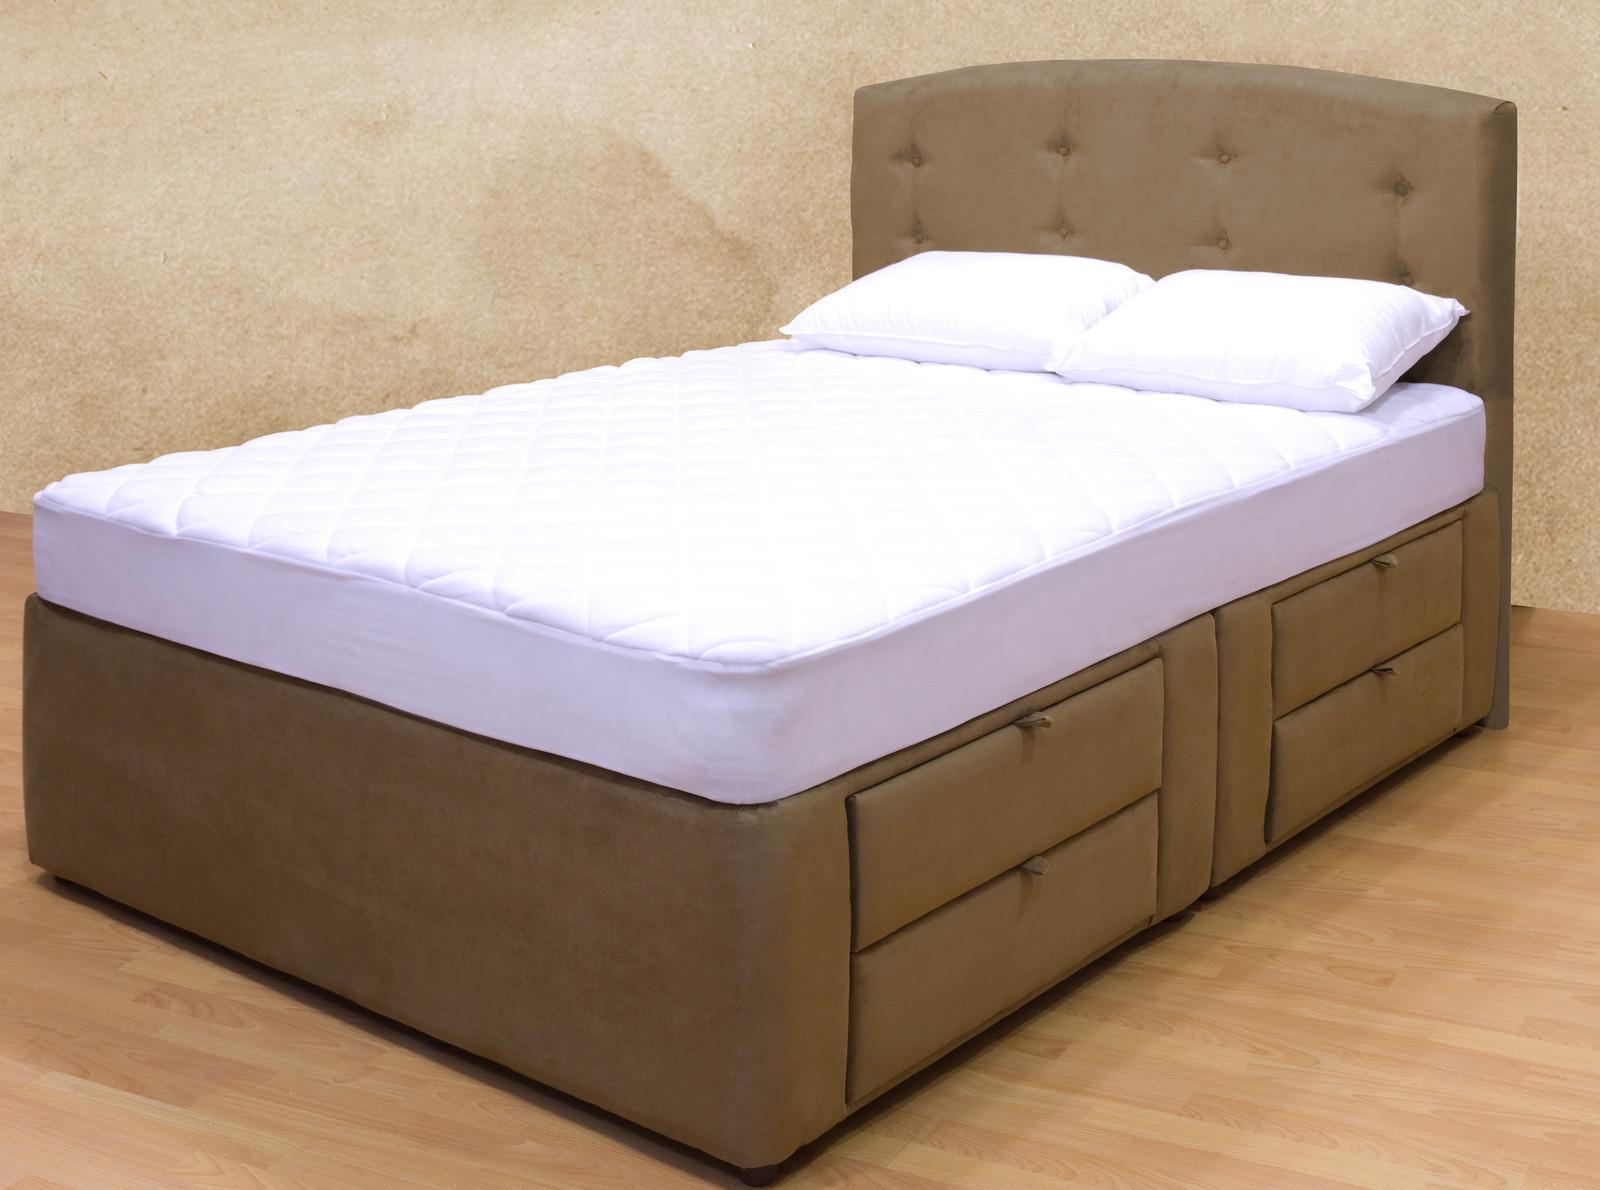 storage beds with drawers tiffany 8-drawer platform bed / storage mattress bed NMOLMLZ